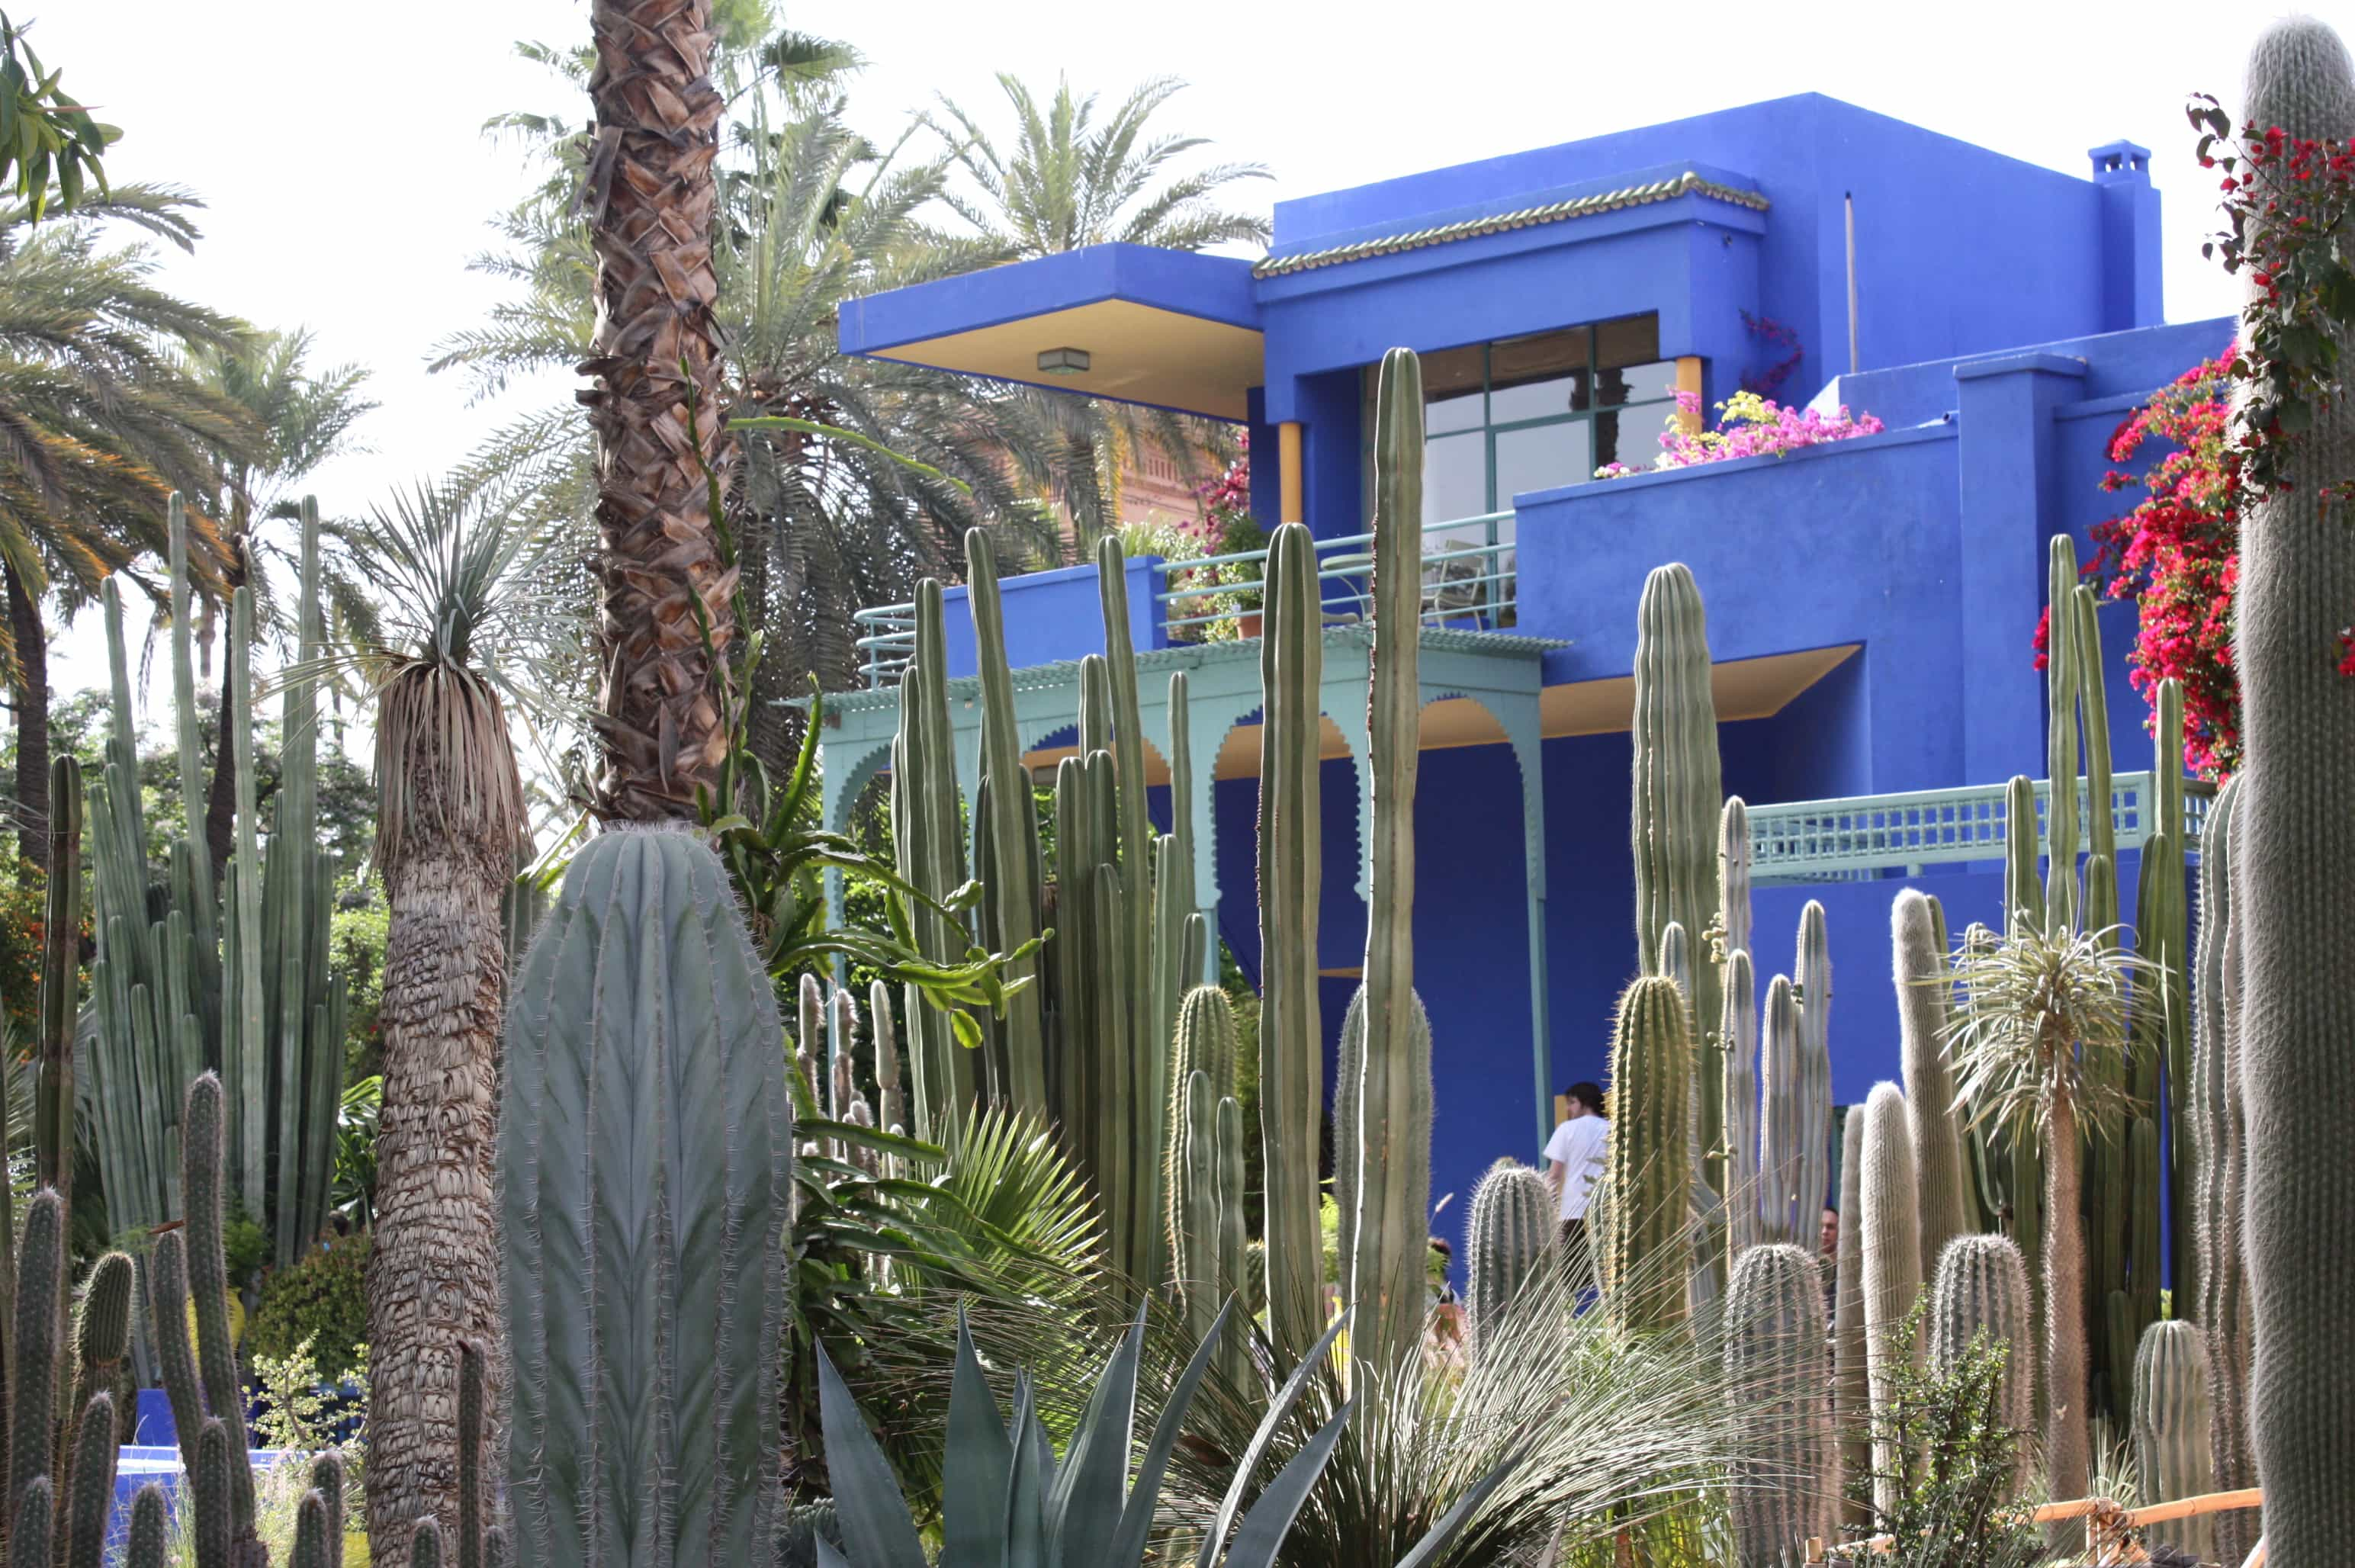 Marjorelle blue house